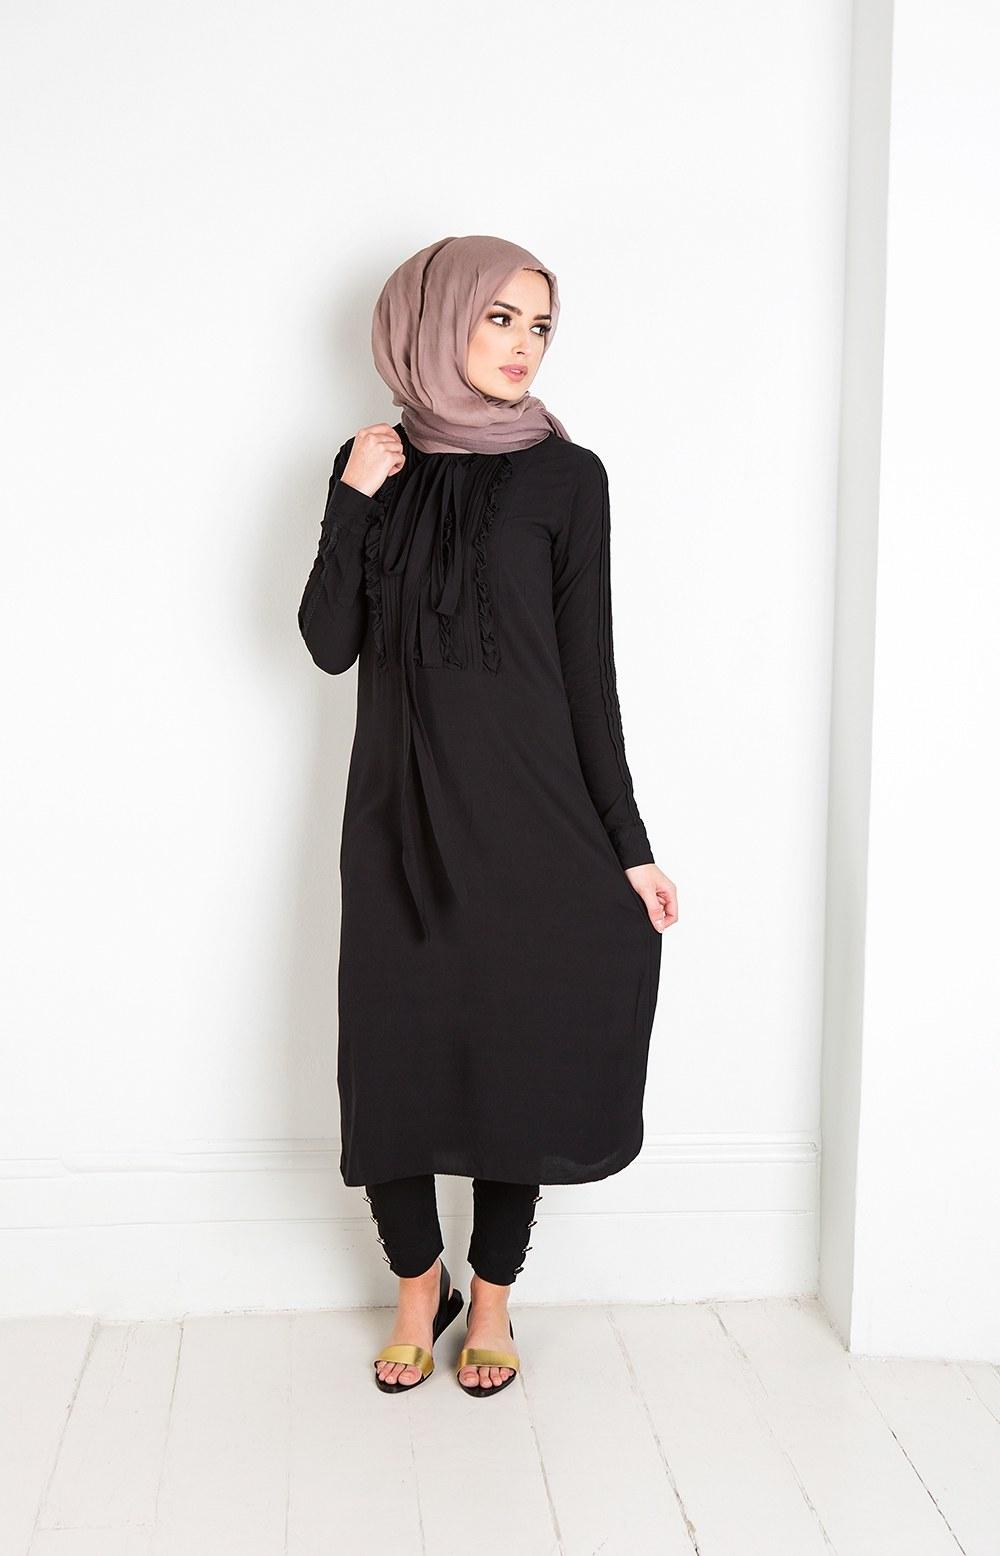 Model Model Baju Lebaran Syahrini 2018 Nkde Lebaran 2018 Hari Apa Puasab